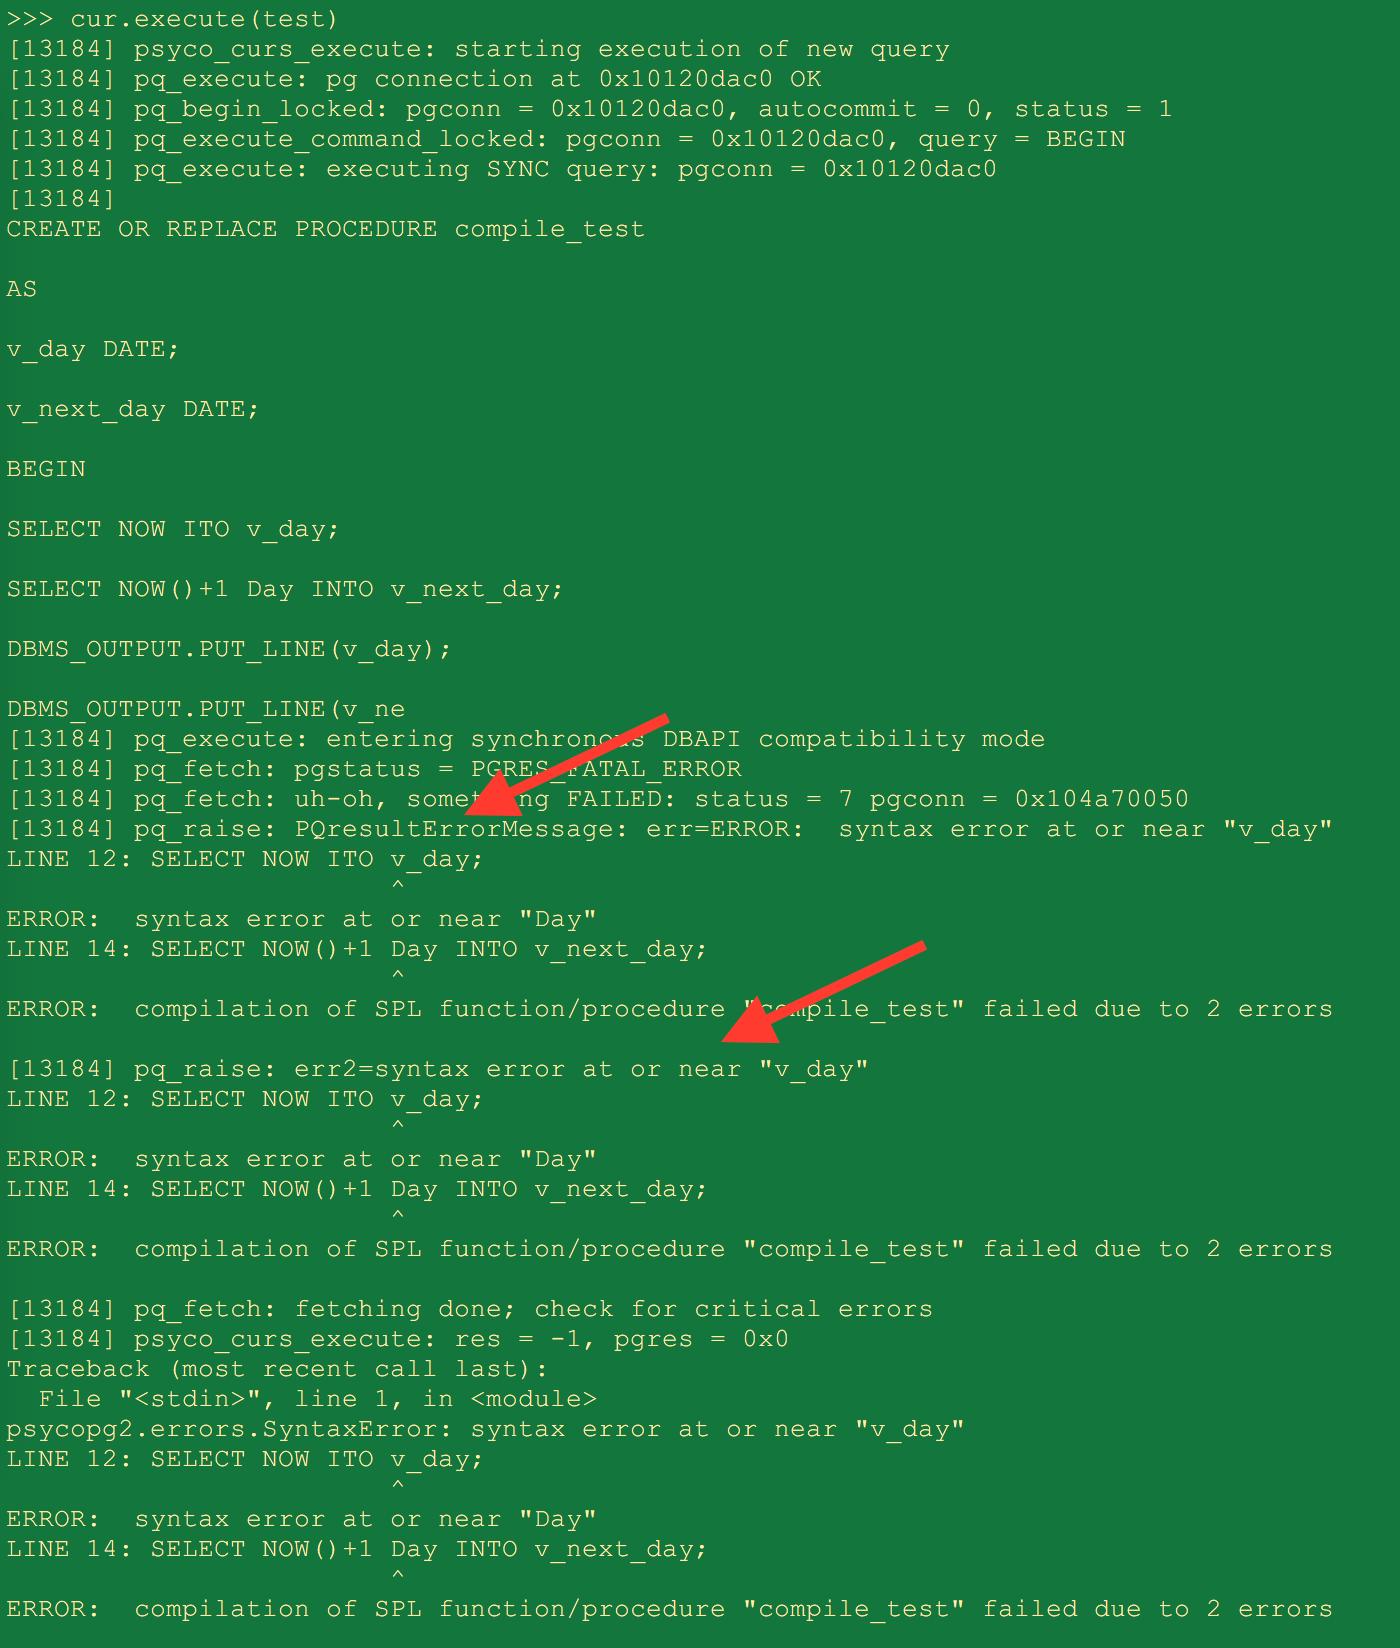 psycopg2 ProgrammingError exception did not return all the